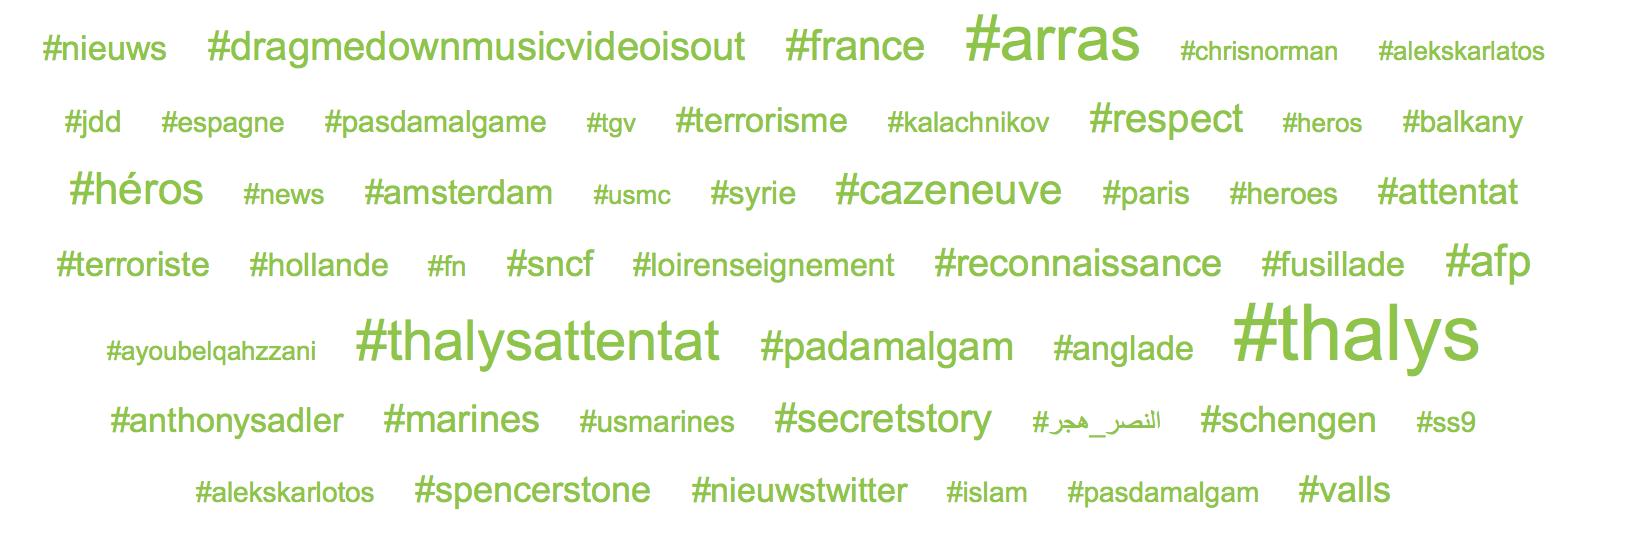 Hashtag attentat Thalys Arras